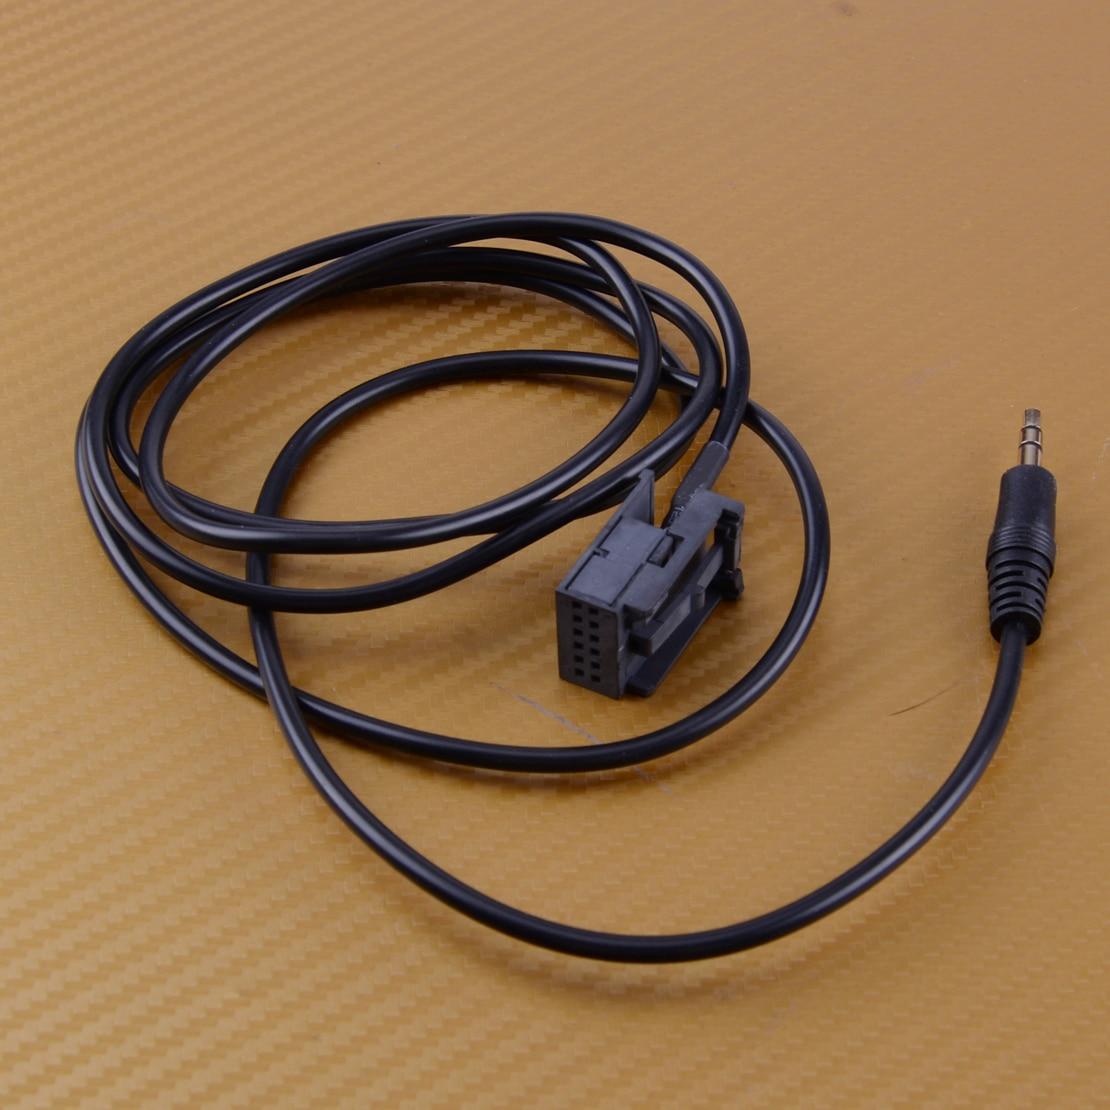 Citall adaptador de 2 pinos e 3.5mm, adaptador de entrada de carro, rádio aux, entrada de 3.5mm, adequado para opel vauxhall cd30 mp3/cd70 navi opel